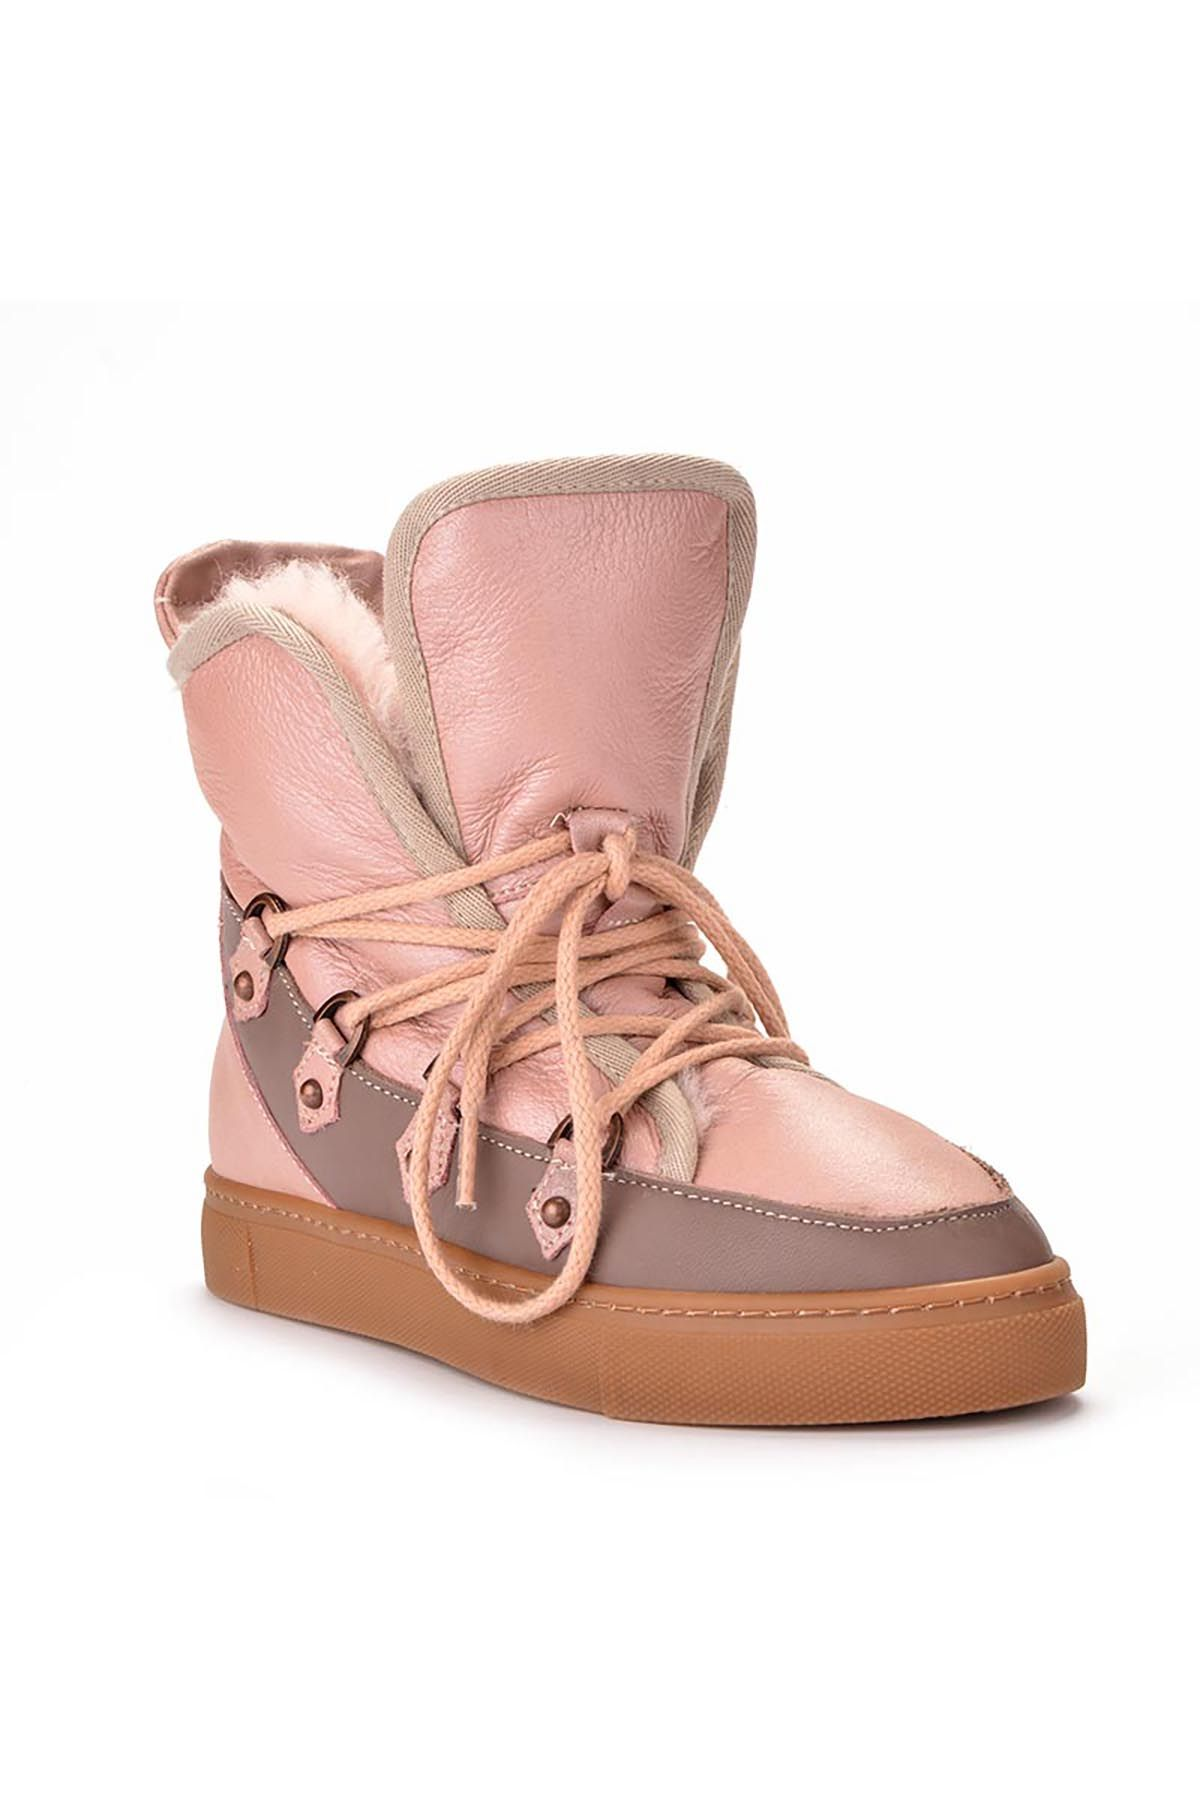 Pegia Hakiki Deri İçi Kürklü Bayan Sneaker Bot 157612 Pudra